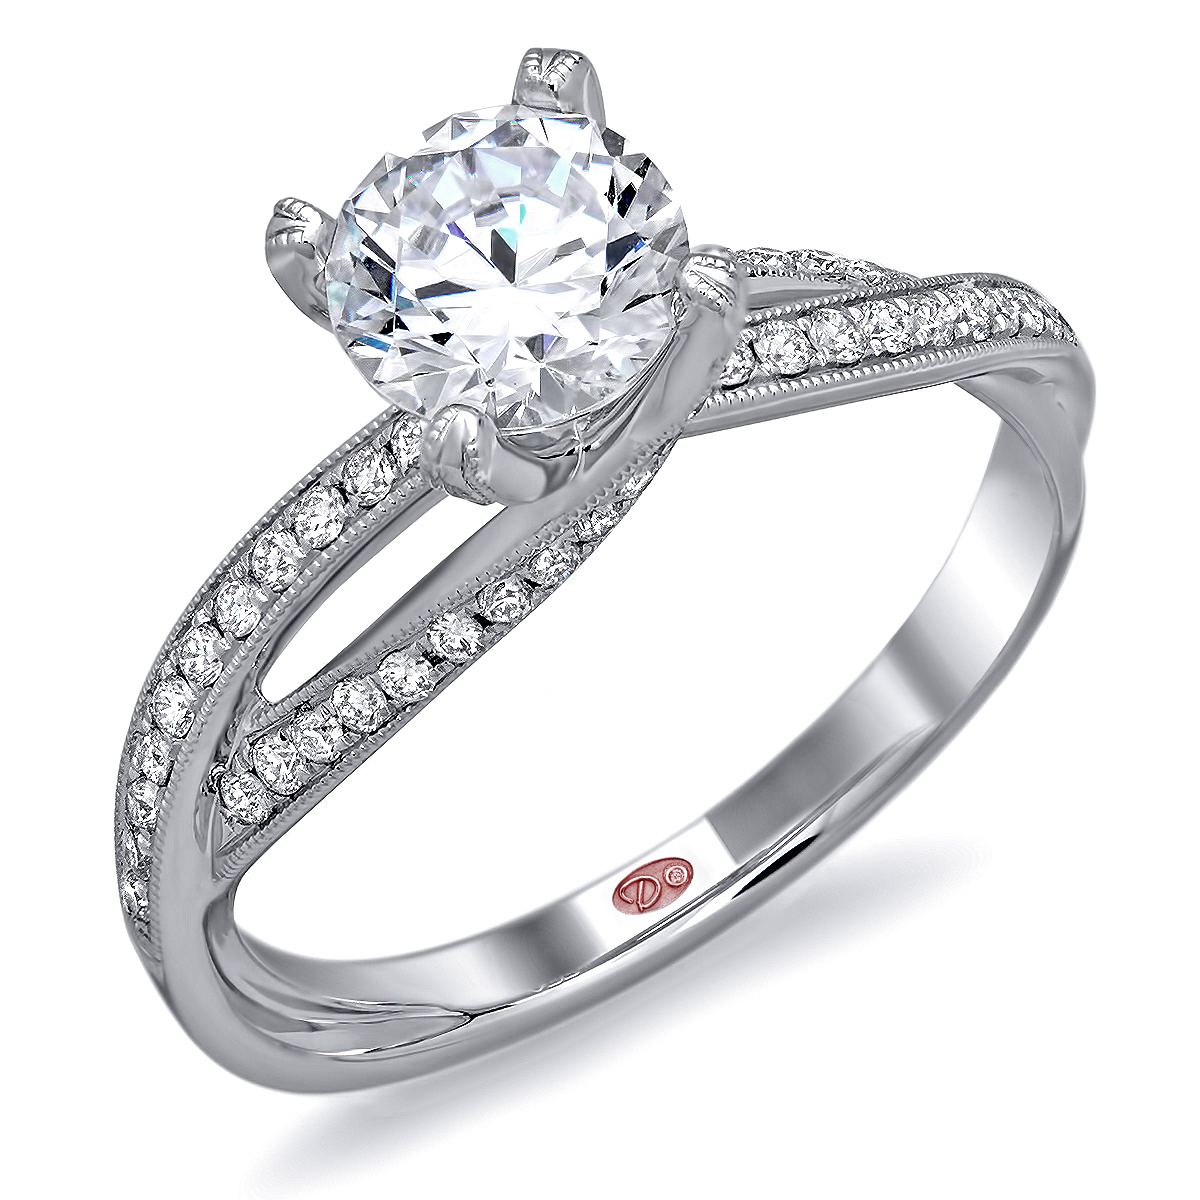 Designer Bridal Rings DW6079